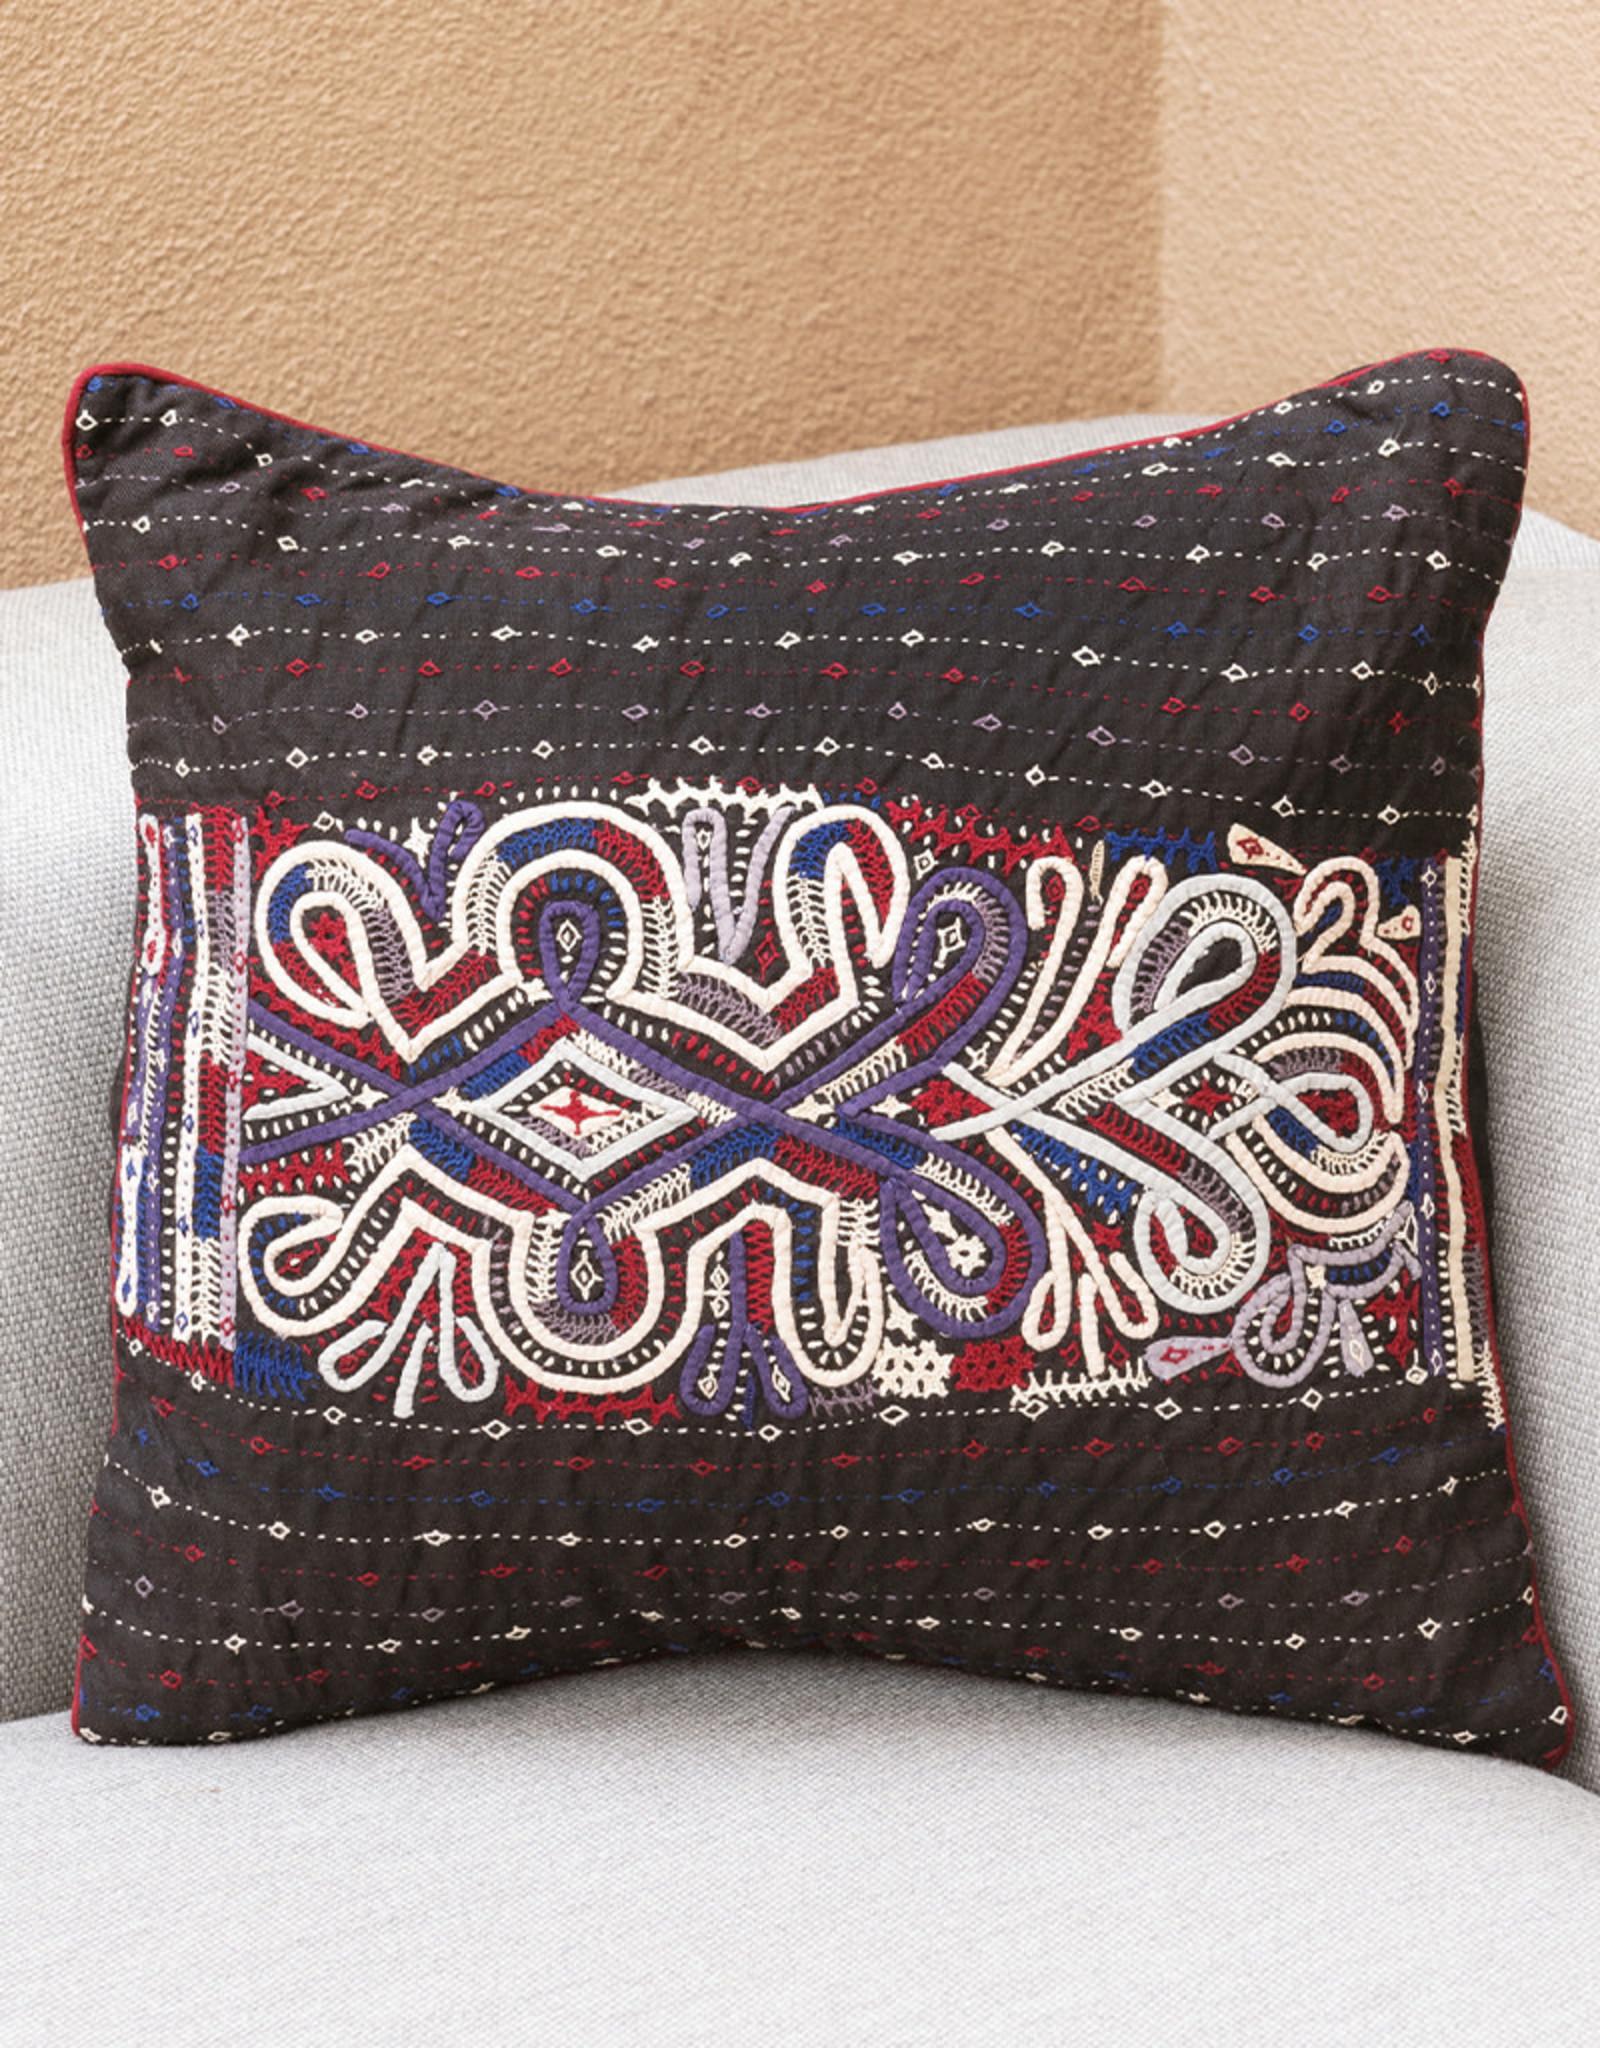 Qasab Ram Horn Pillow Black